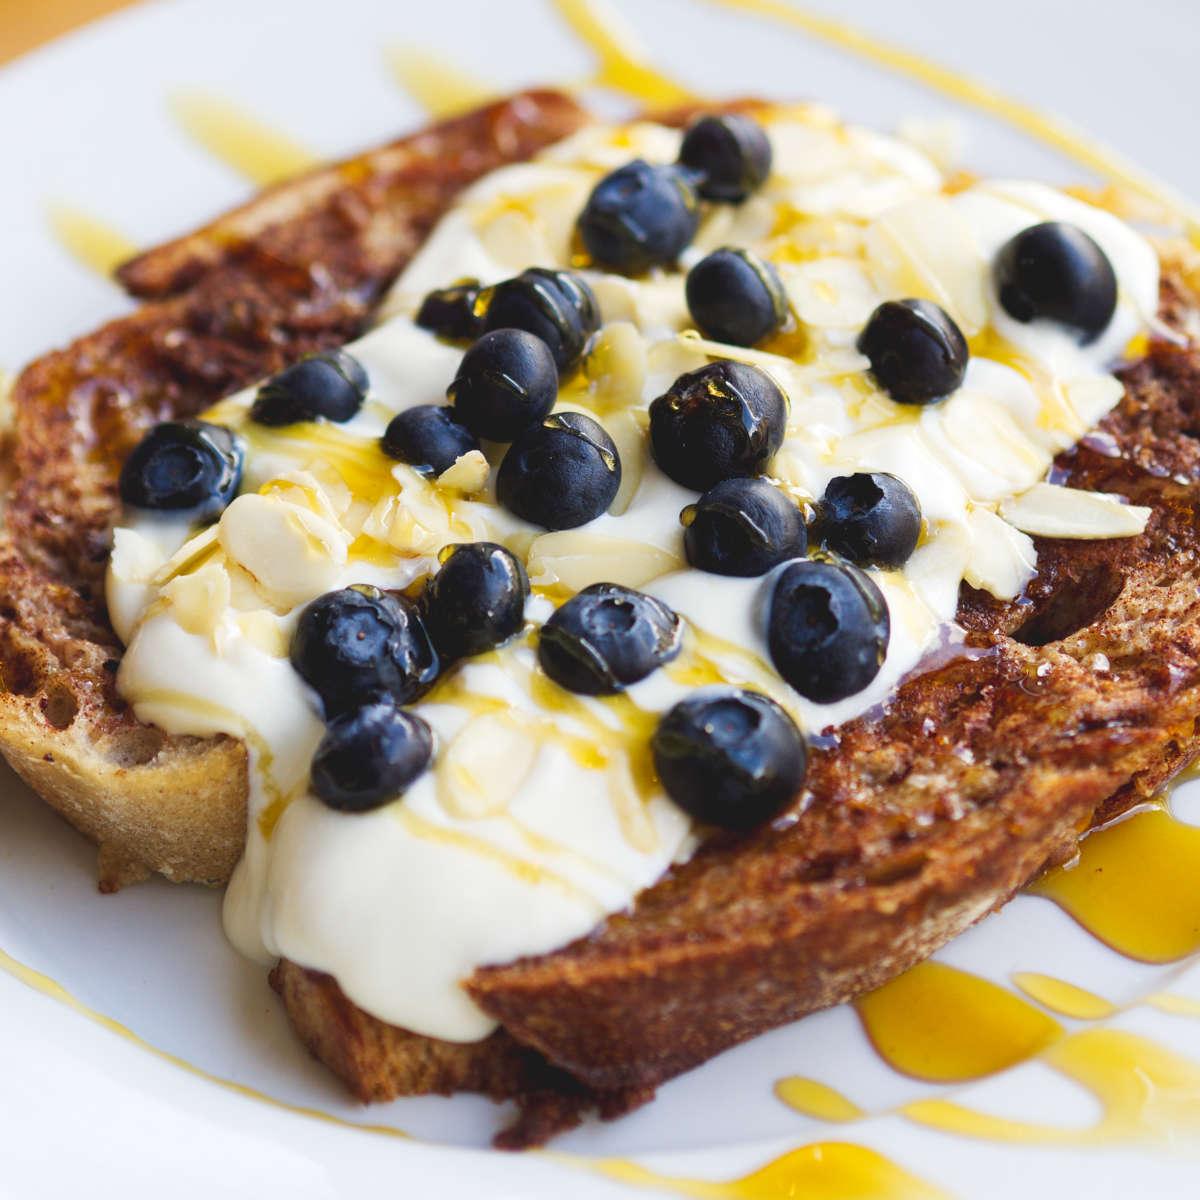 Vegan french toast at Chapter One Coffee Shop, Edinburgh